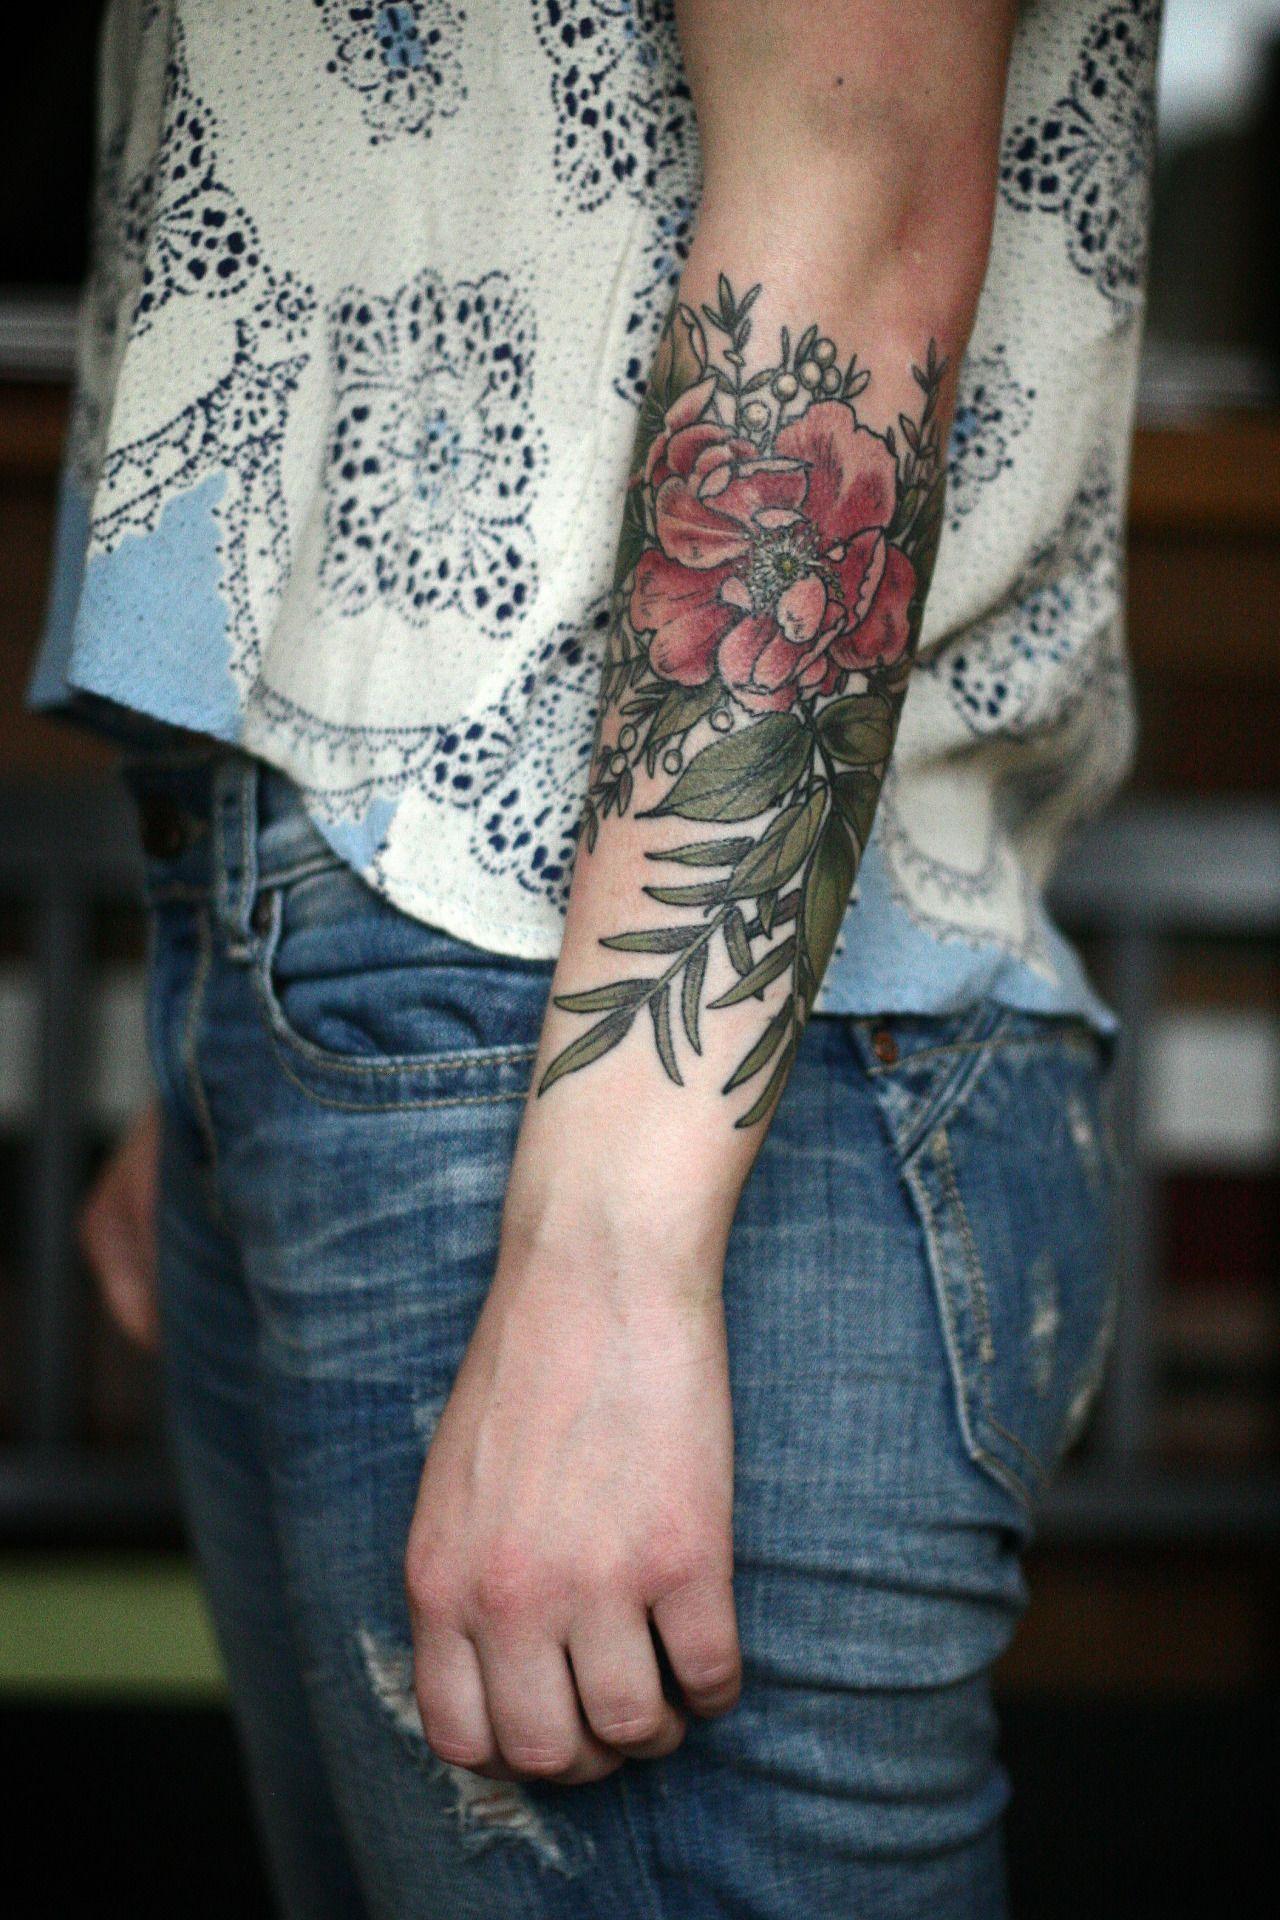 Alice carrier photo tattoos henna tattoo designs arm